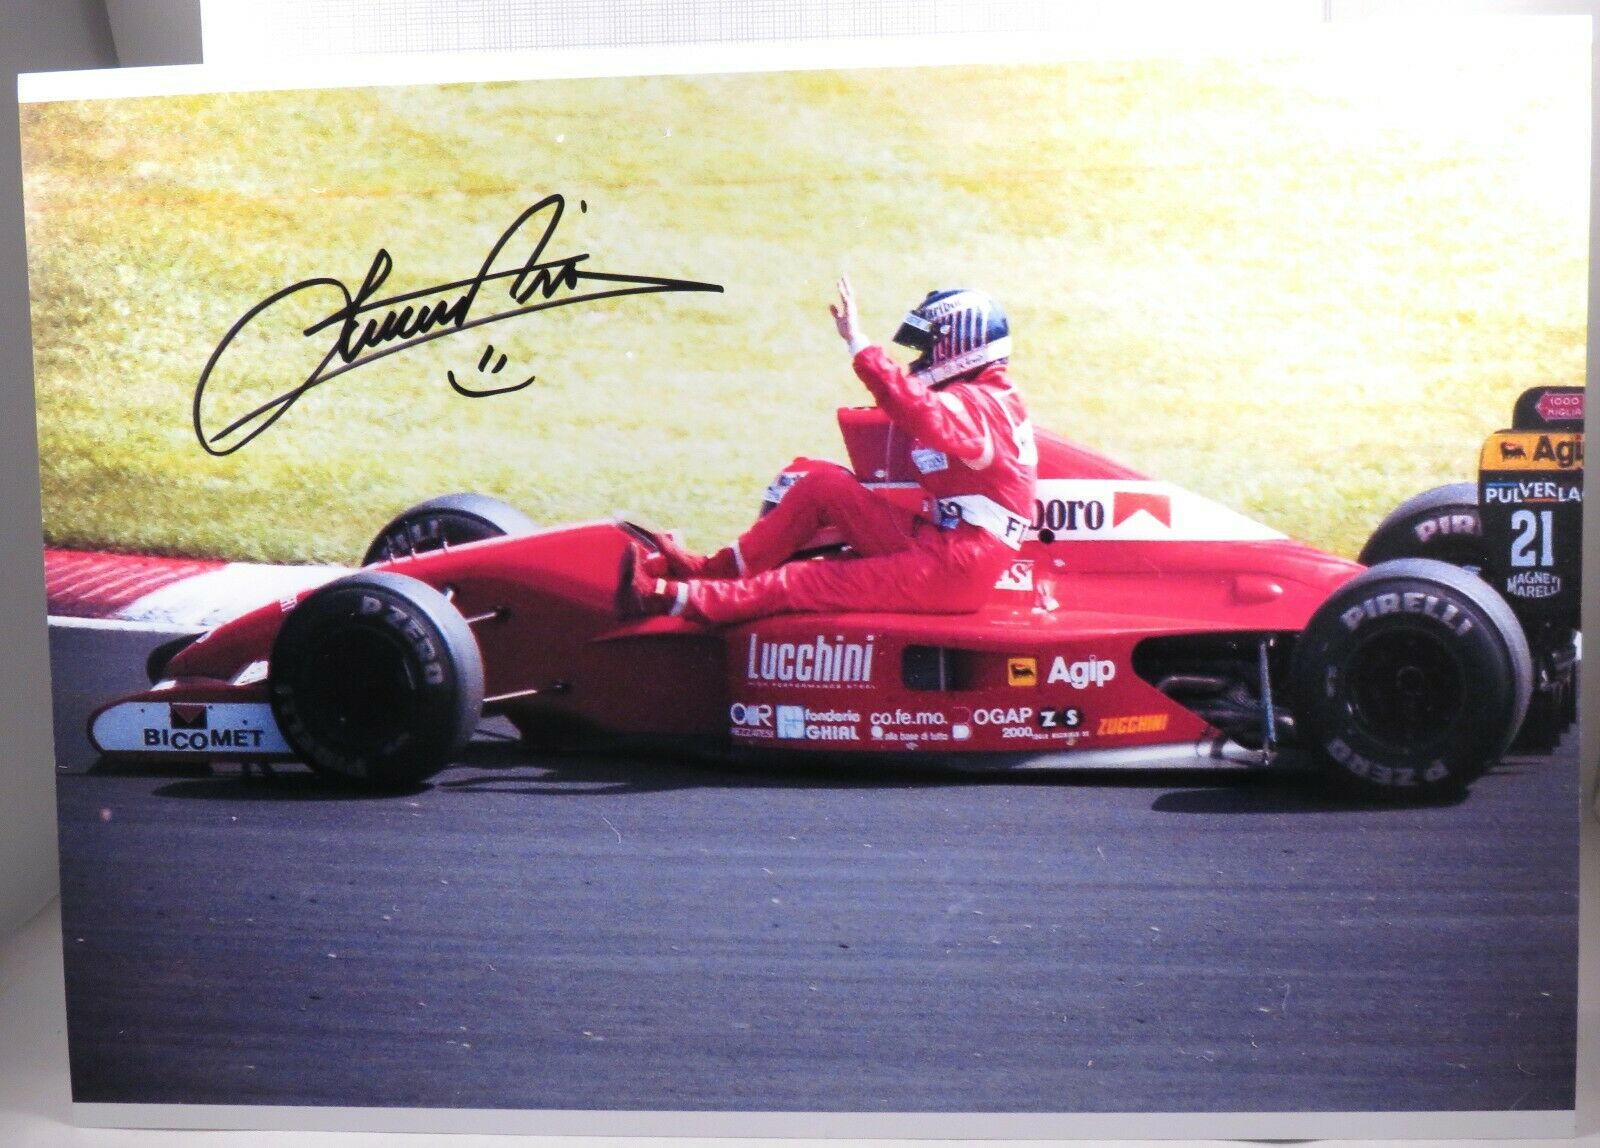 Photo cm21x30 Signed Emanuele Pirro Dallara Judd Canadian GP 1991 Taxi LETHO